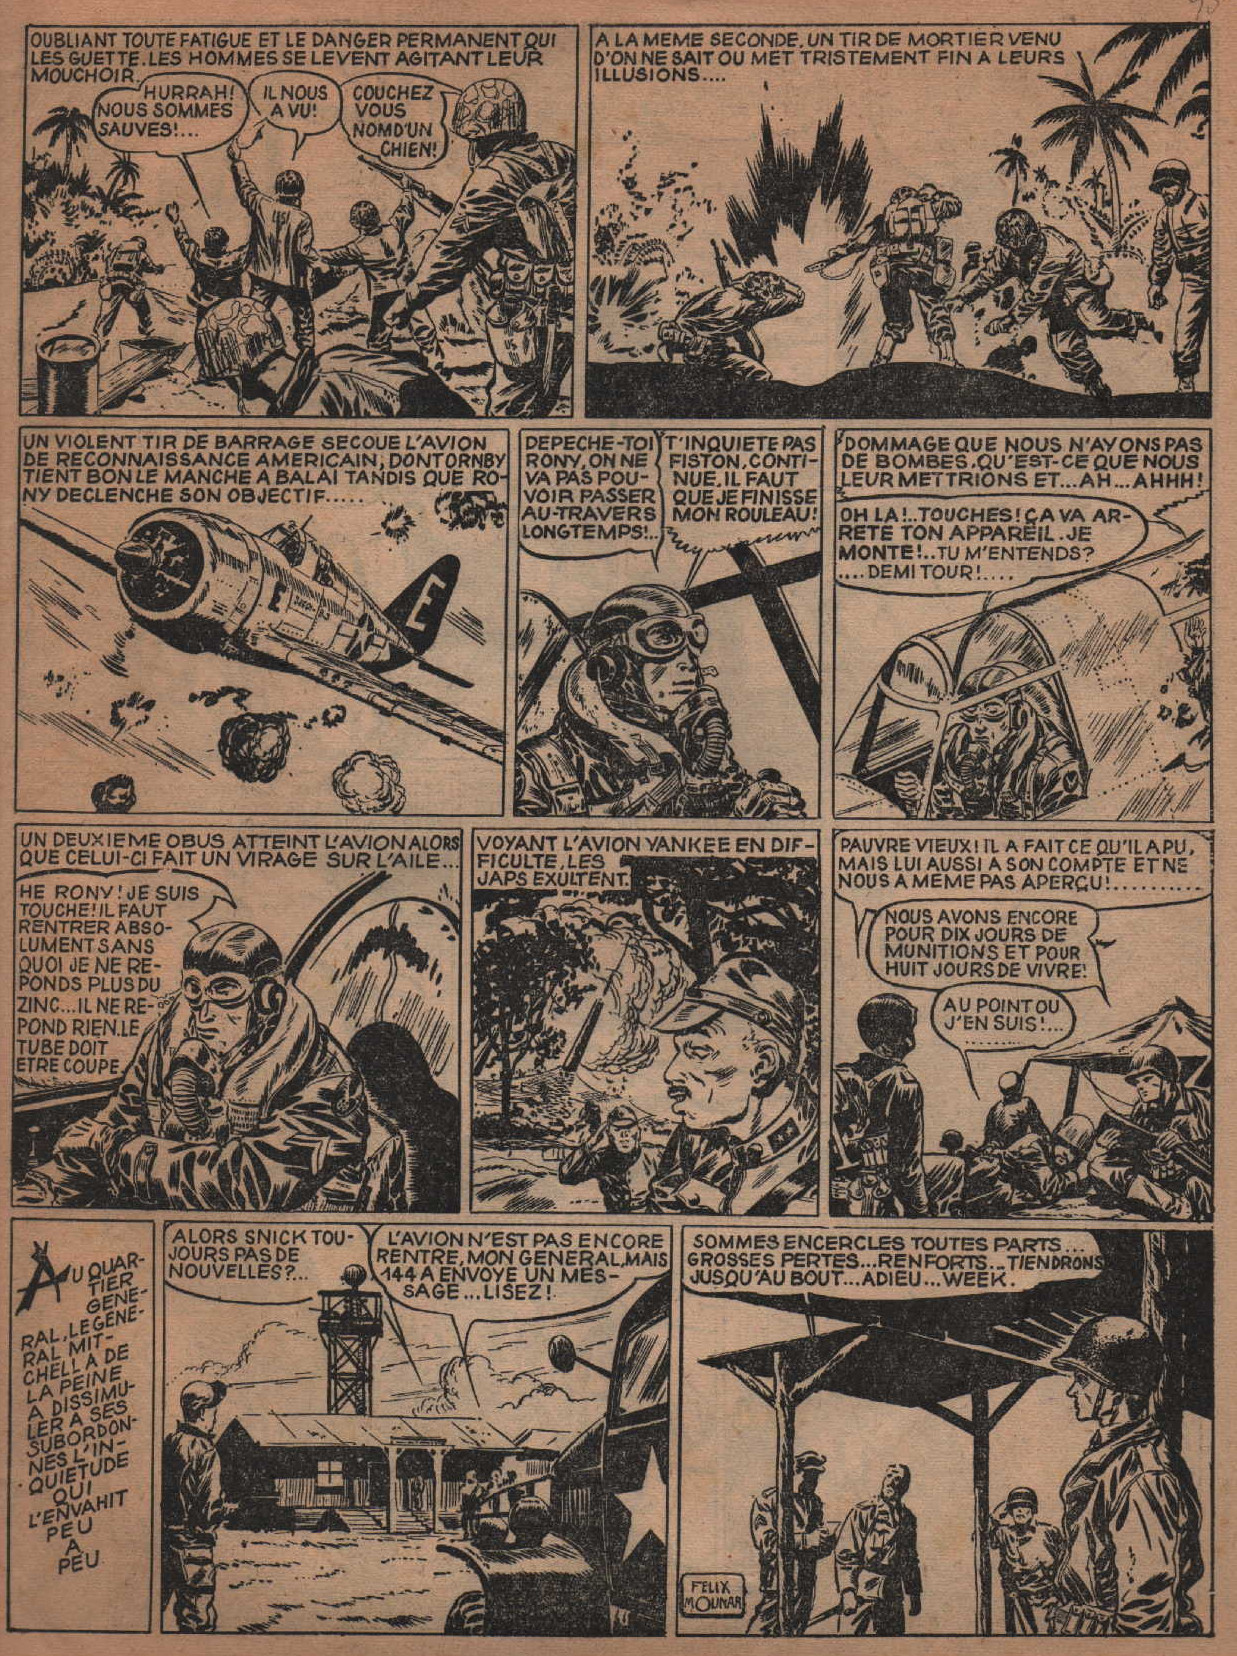 « Le Fou de Madang » Garry n° 9 (20/10/1948).